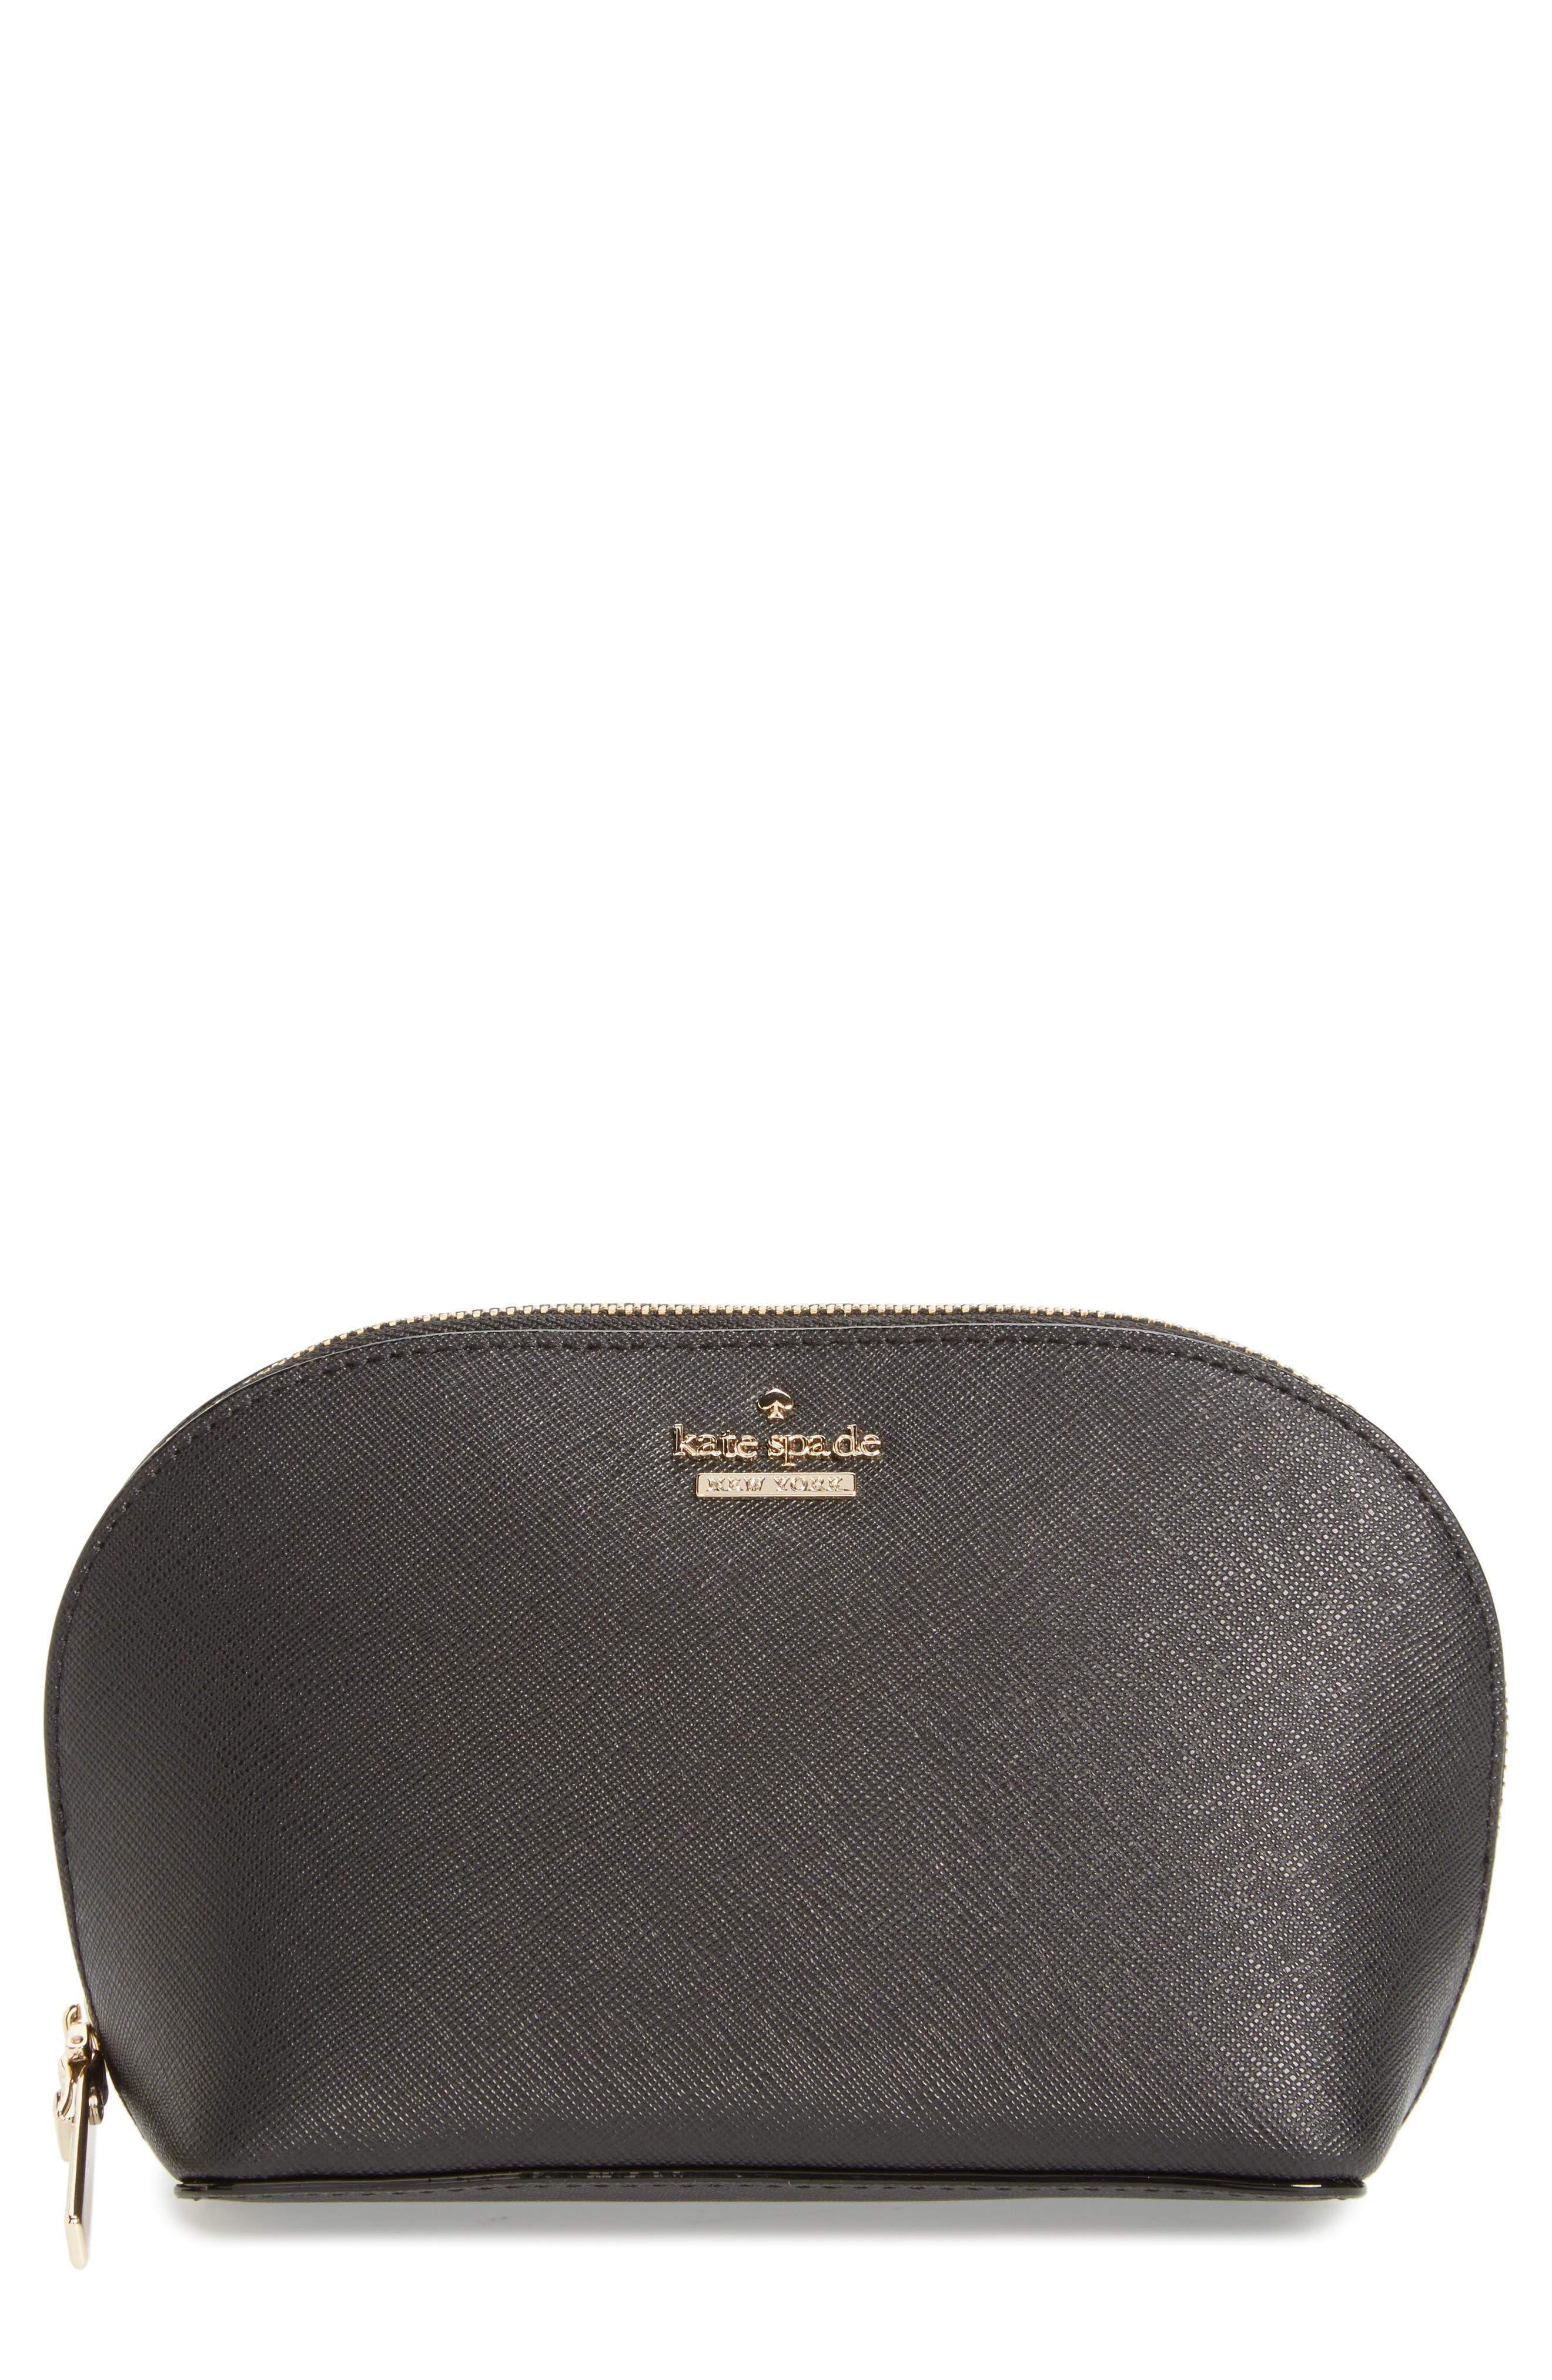 cameron street - small abalene leather cosmetics bag,                             Main thumbnail 1, color,                             Black